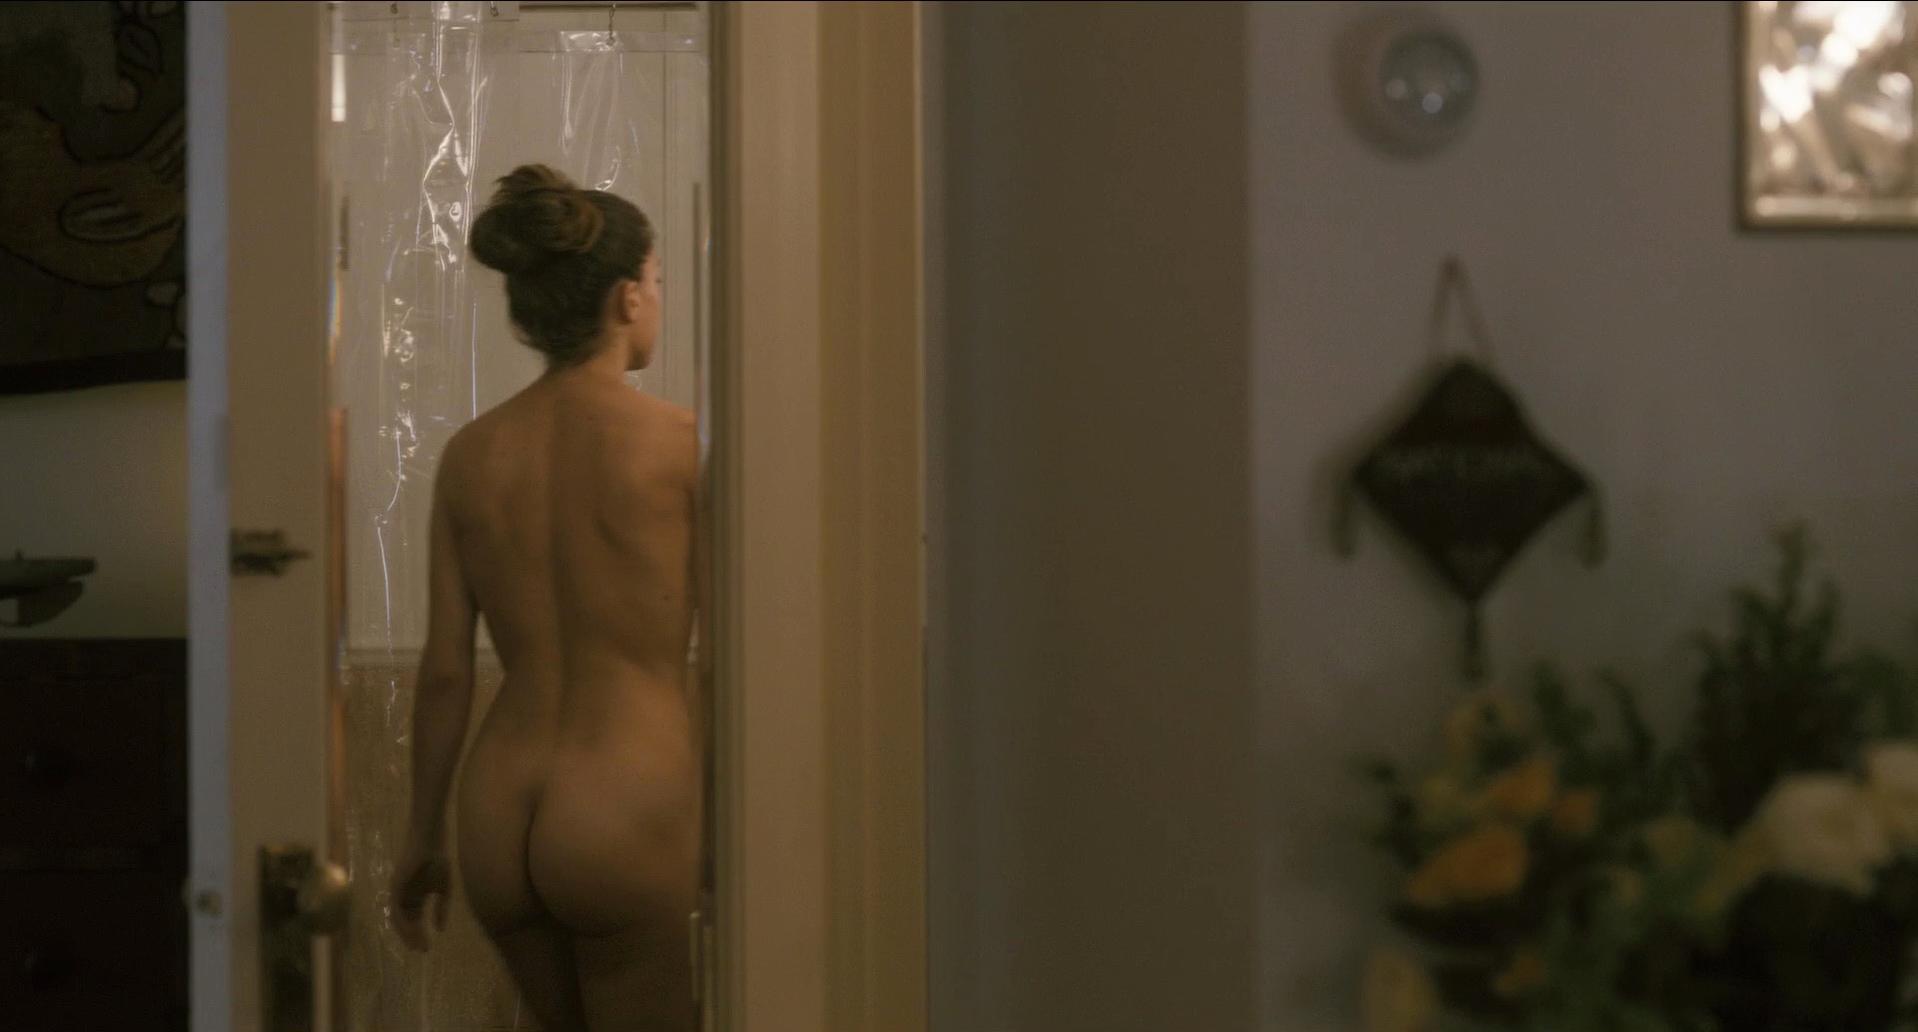 Melanie Merkosky nude - Le regne de la beaute (2014)